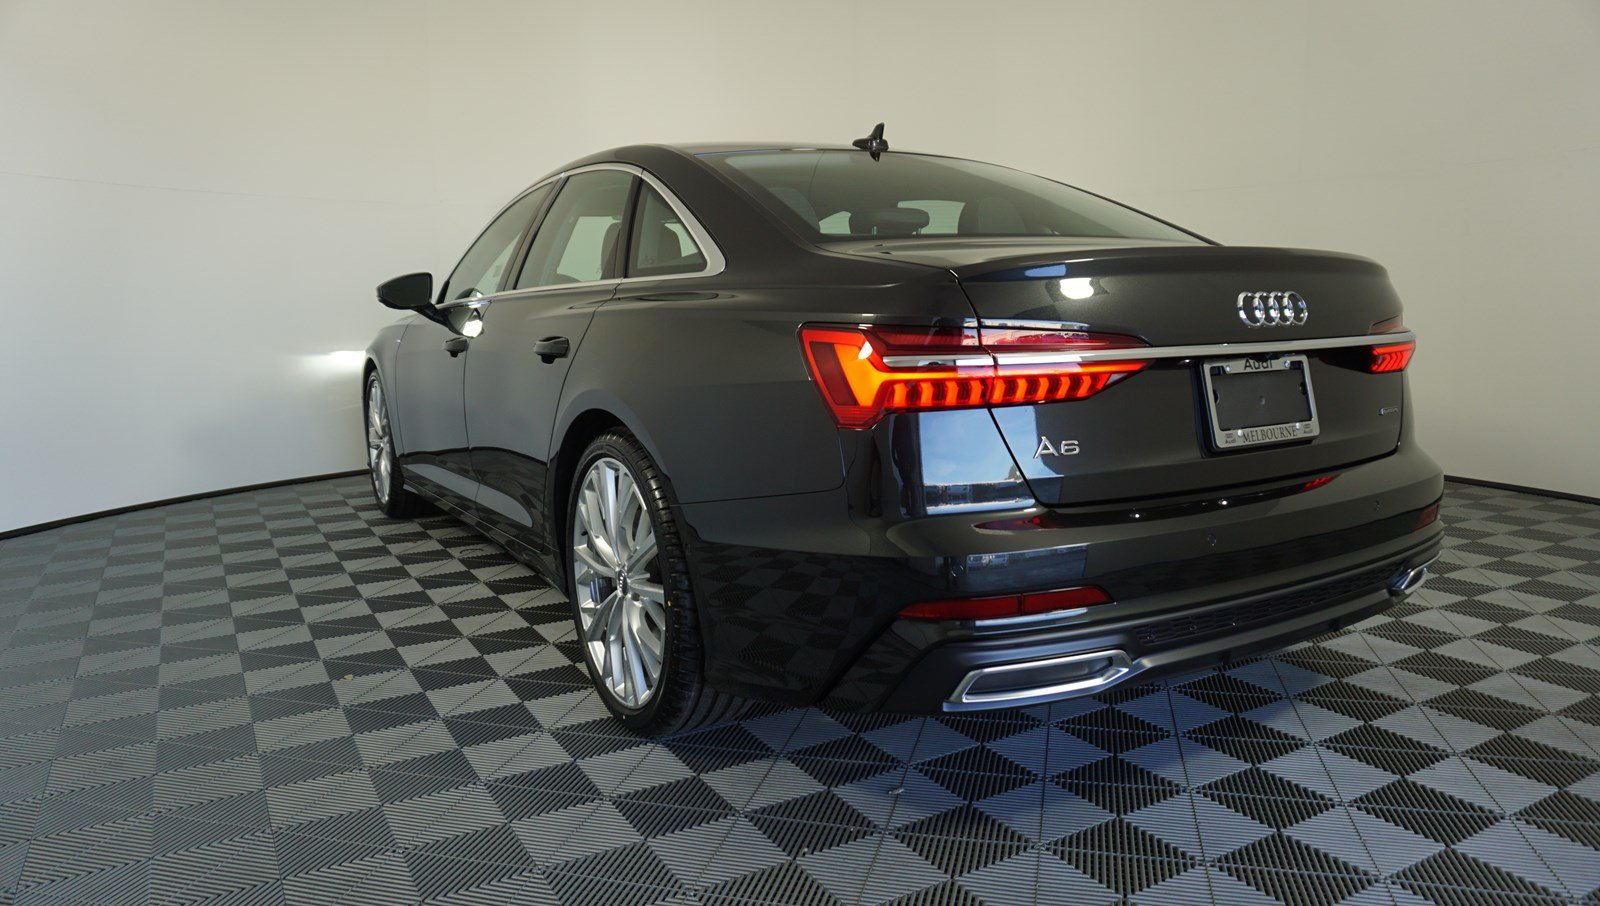 New 2019 Audi A6 3 0T Prestige For Sale | Audi Melbourne